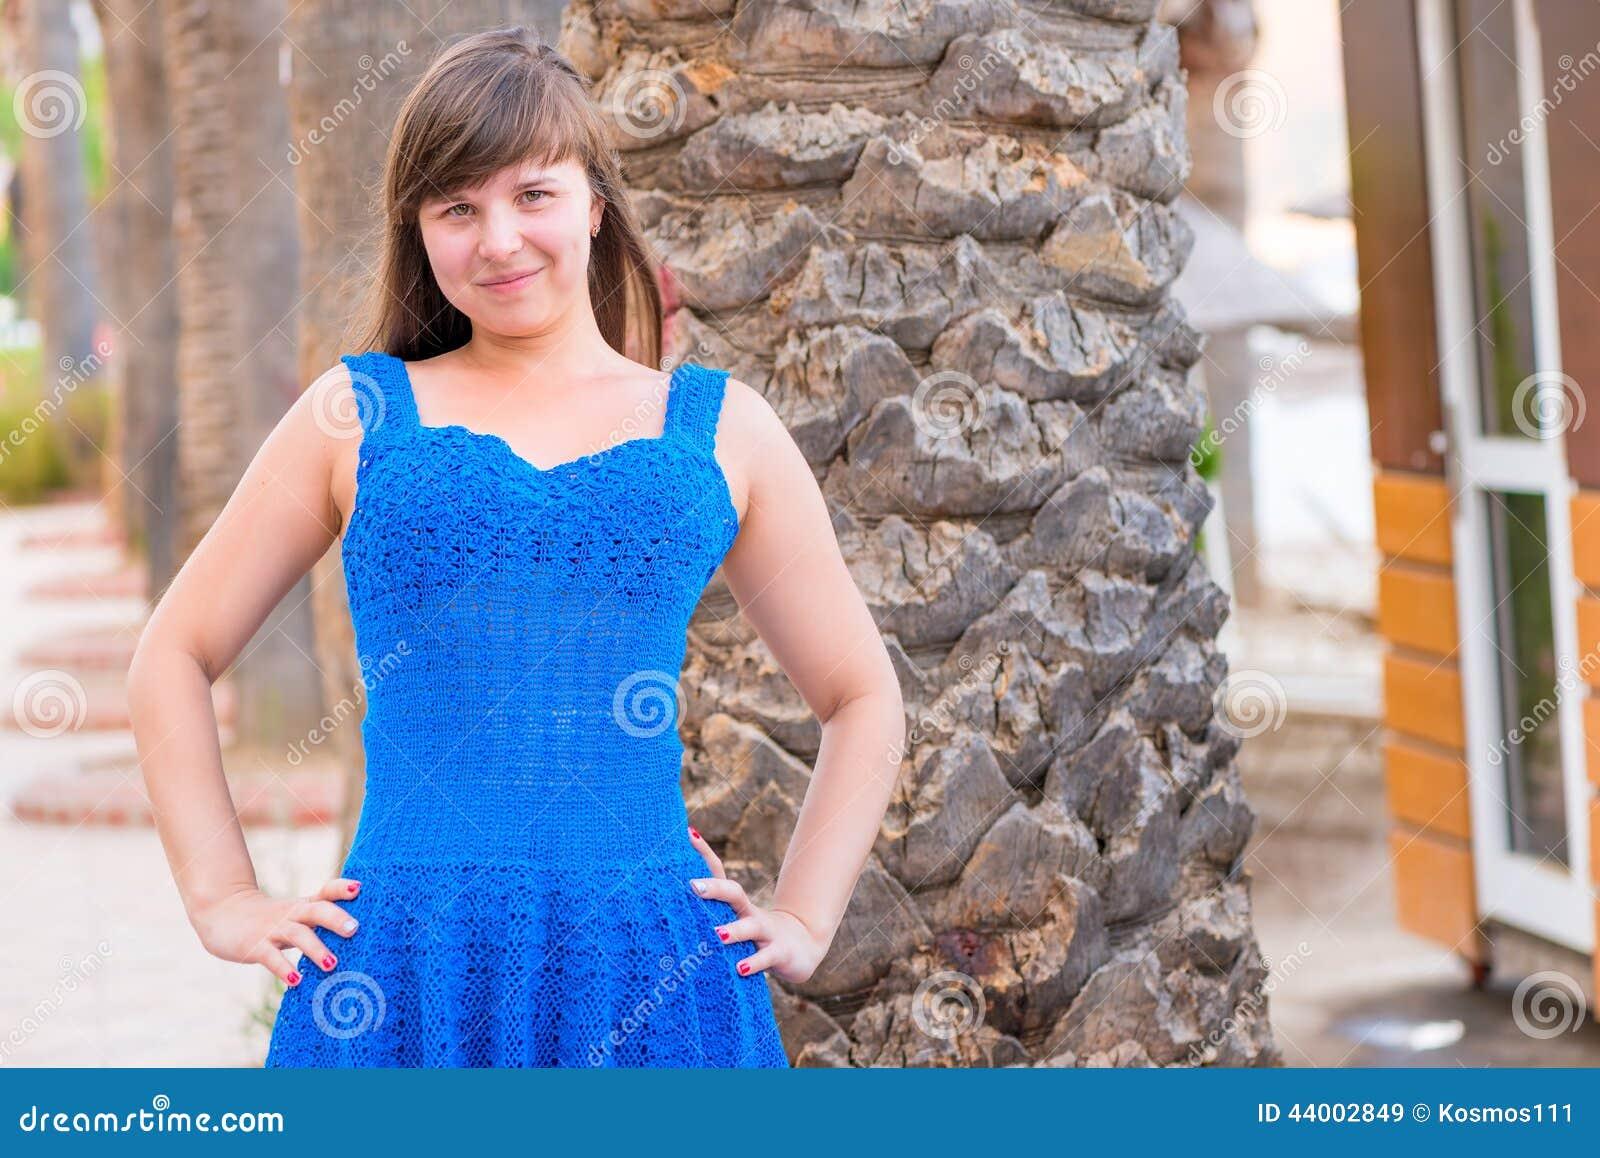 Blue Dresses  Royal Blue amp Baby Blue Dresses  New Look